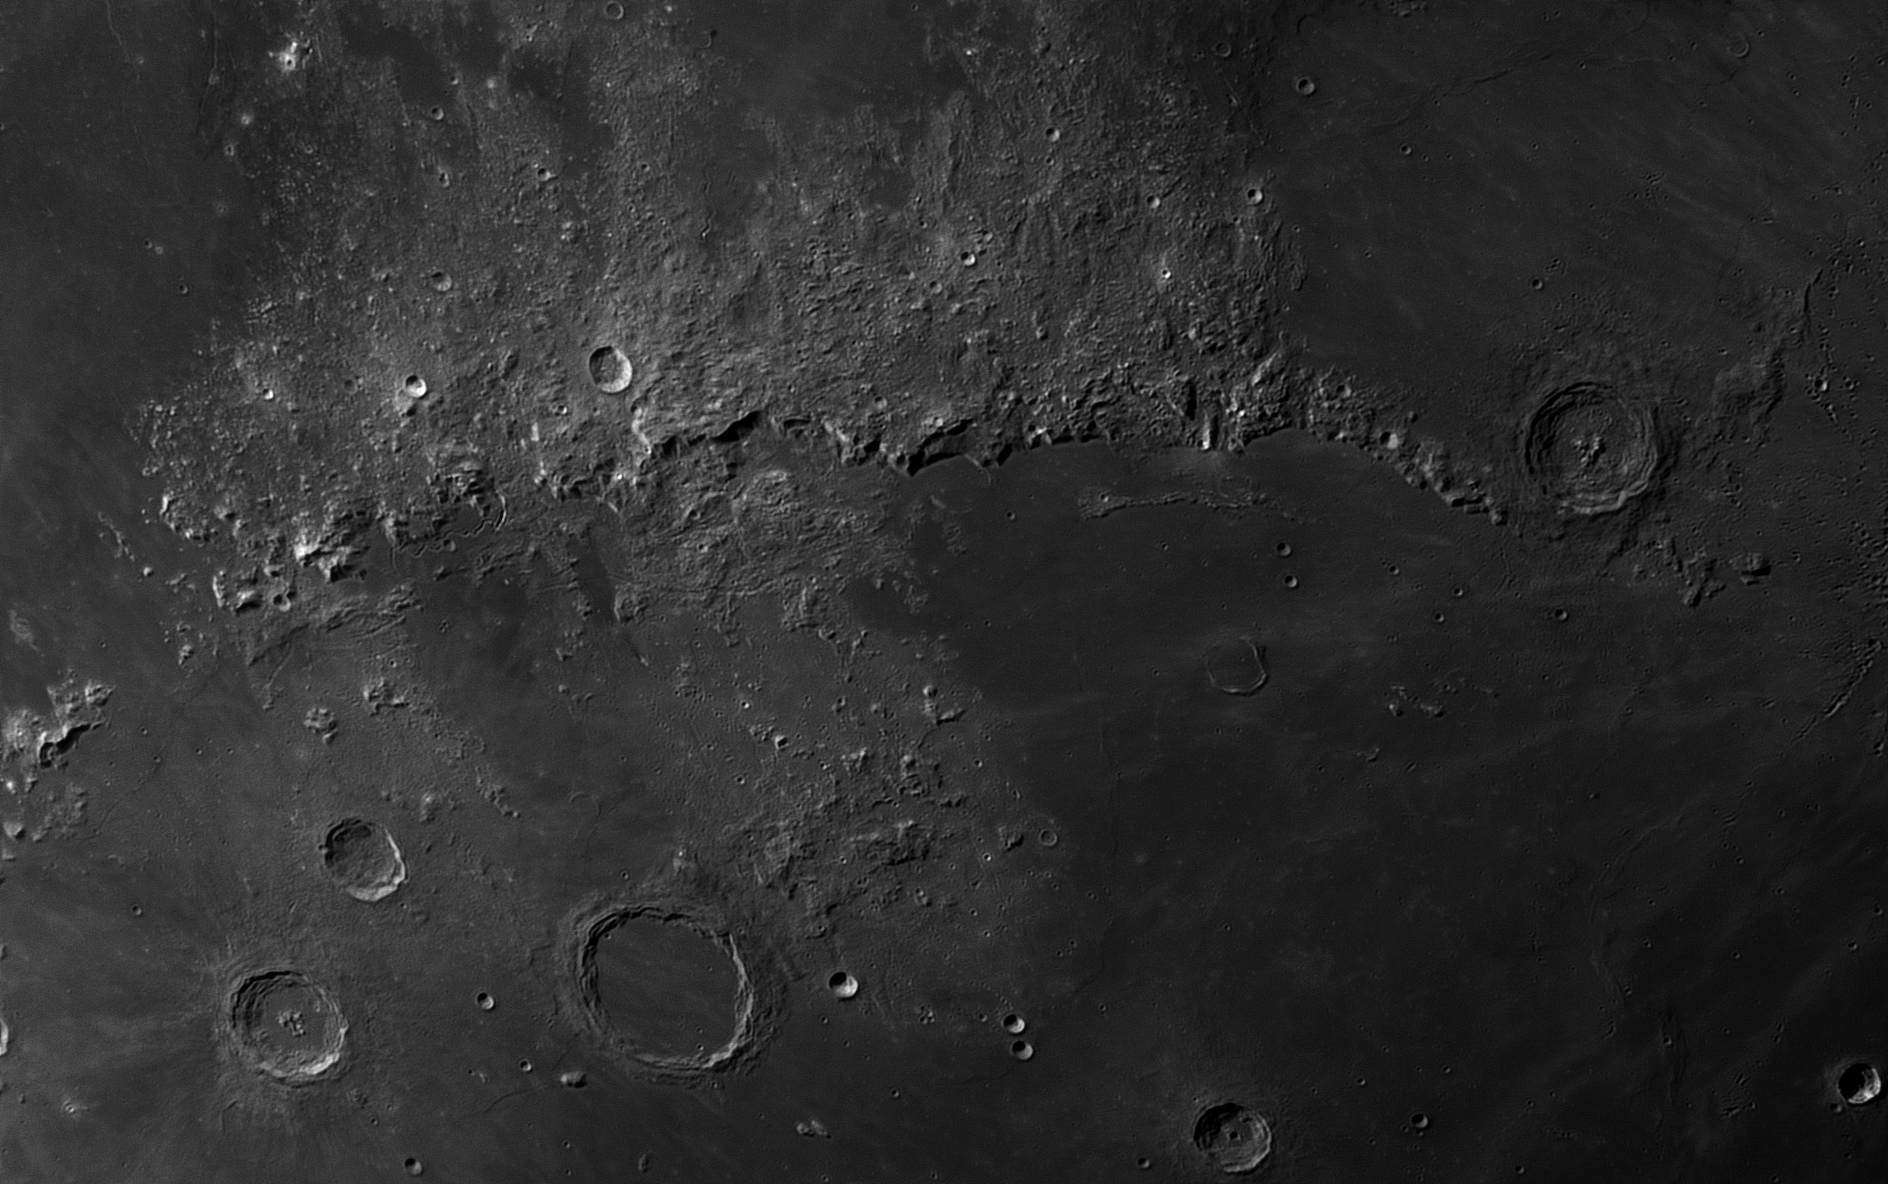 Moon_30_Sep_2017_20_28_42_HaT-F27_ZWO-ASI174MM_AS_F96_grad6_ap560_conv-ps.jpg